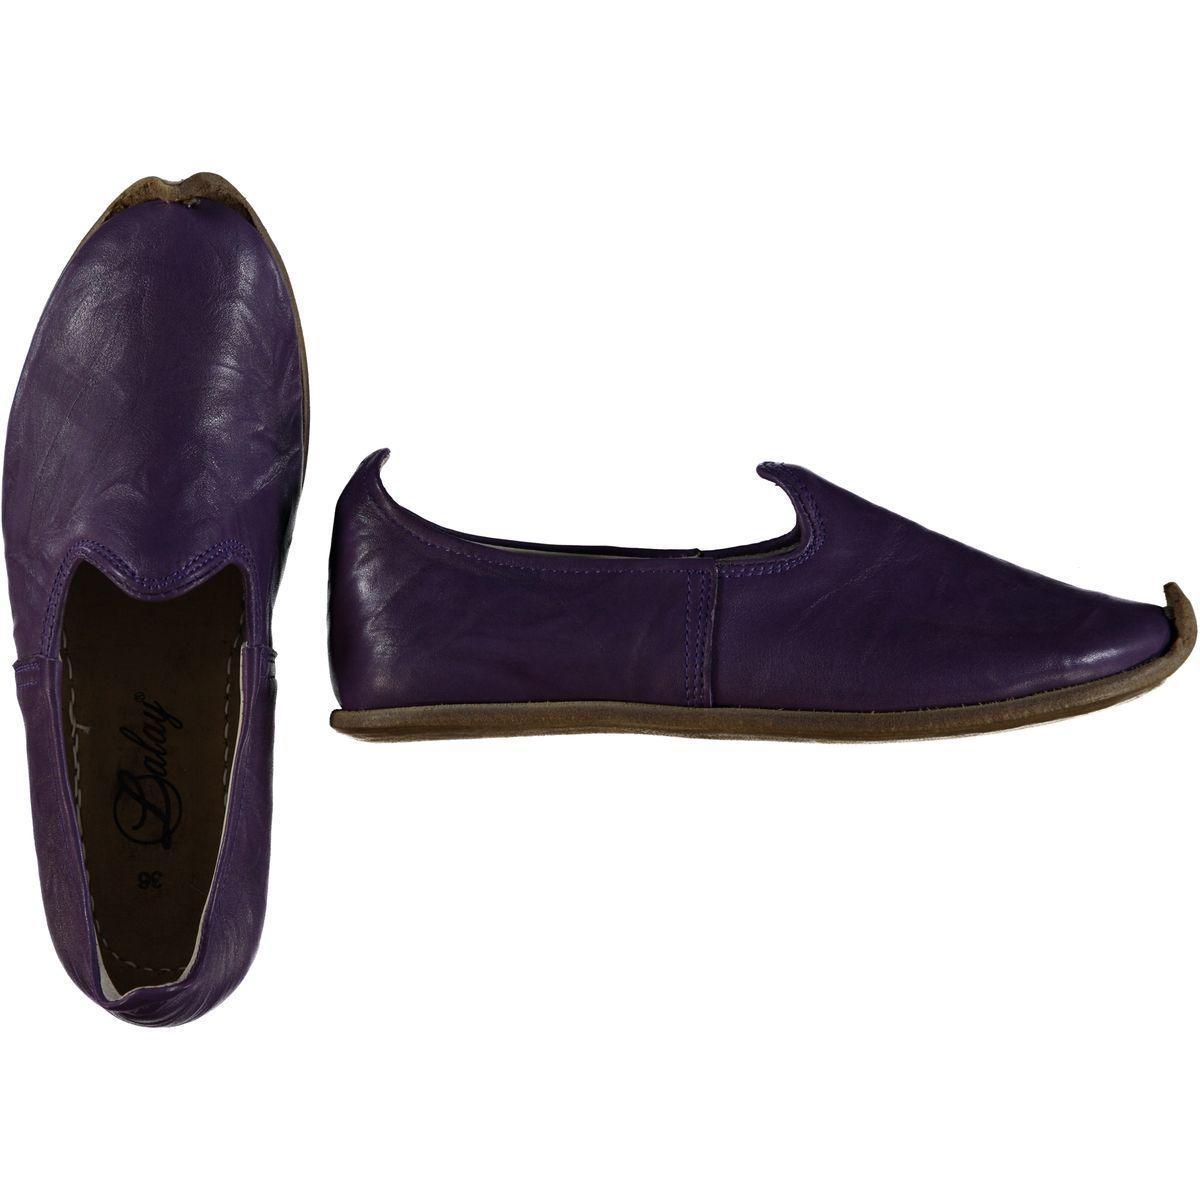 Shoe - Babouche / Leather / Handmade - Dark Purple